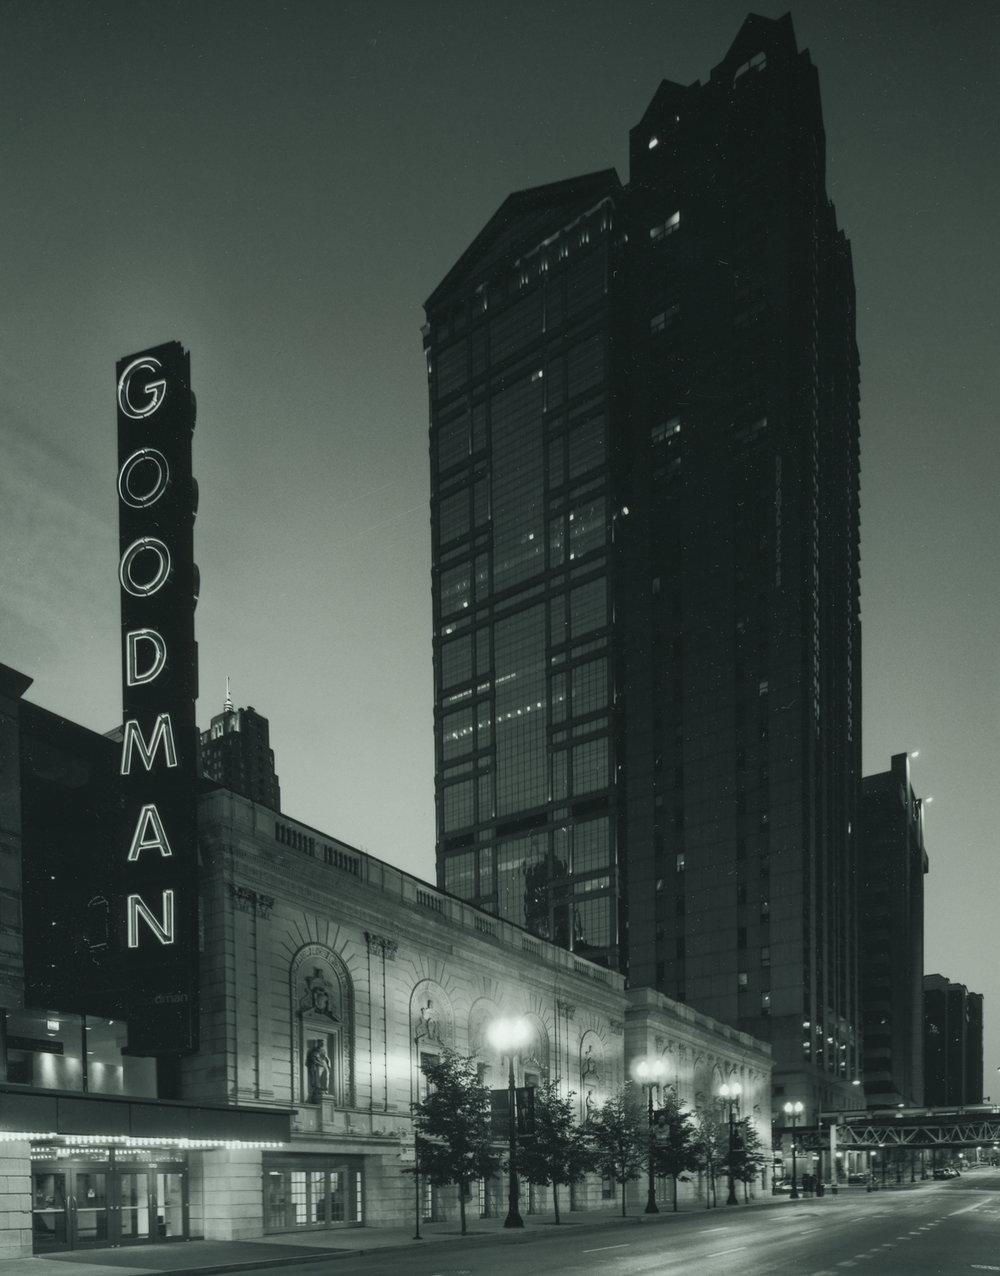 Goodman Theater ©2002